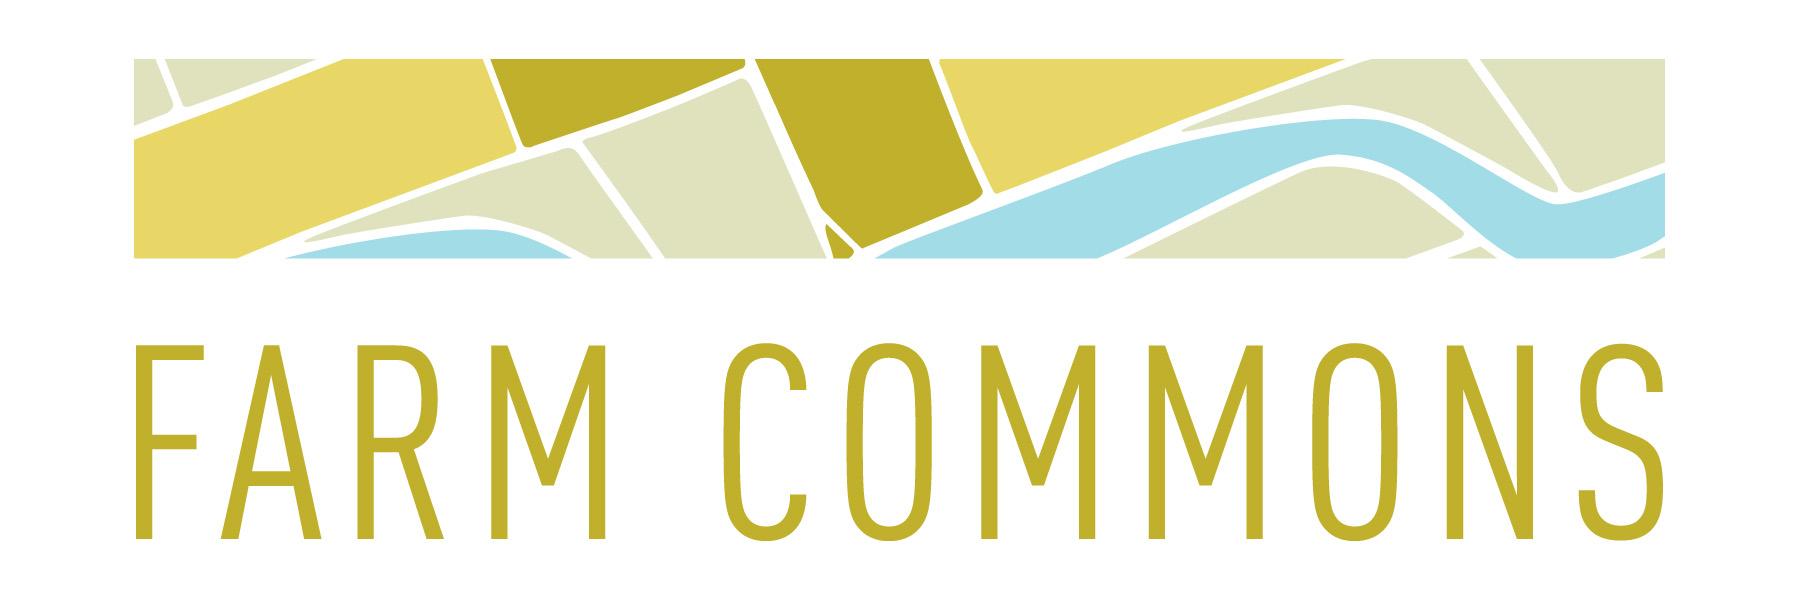 farm commons_logo